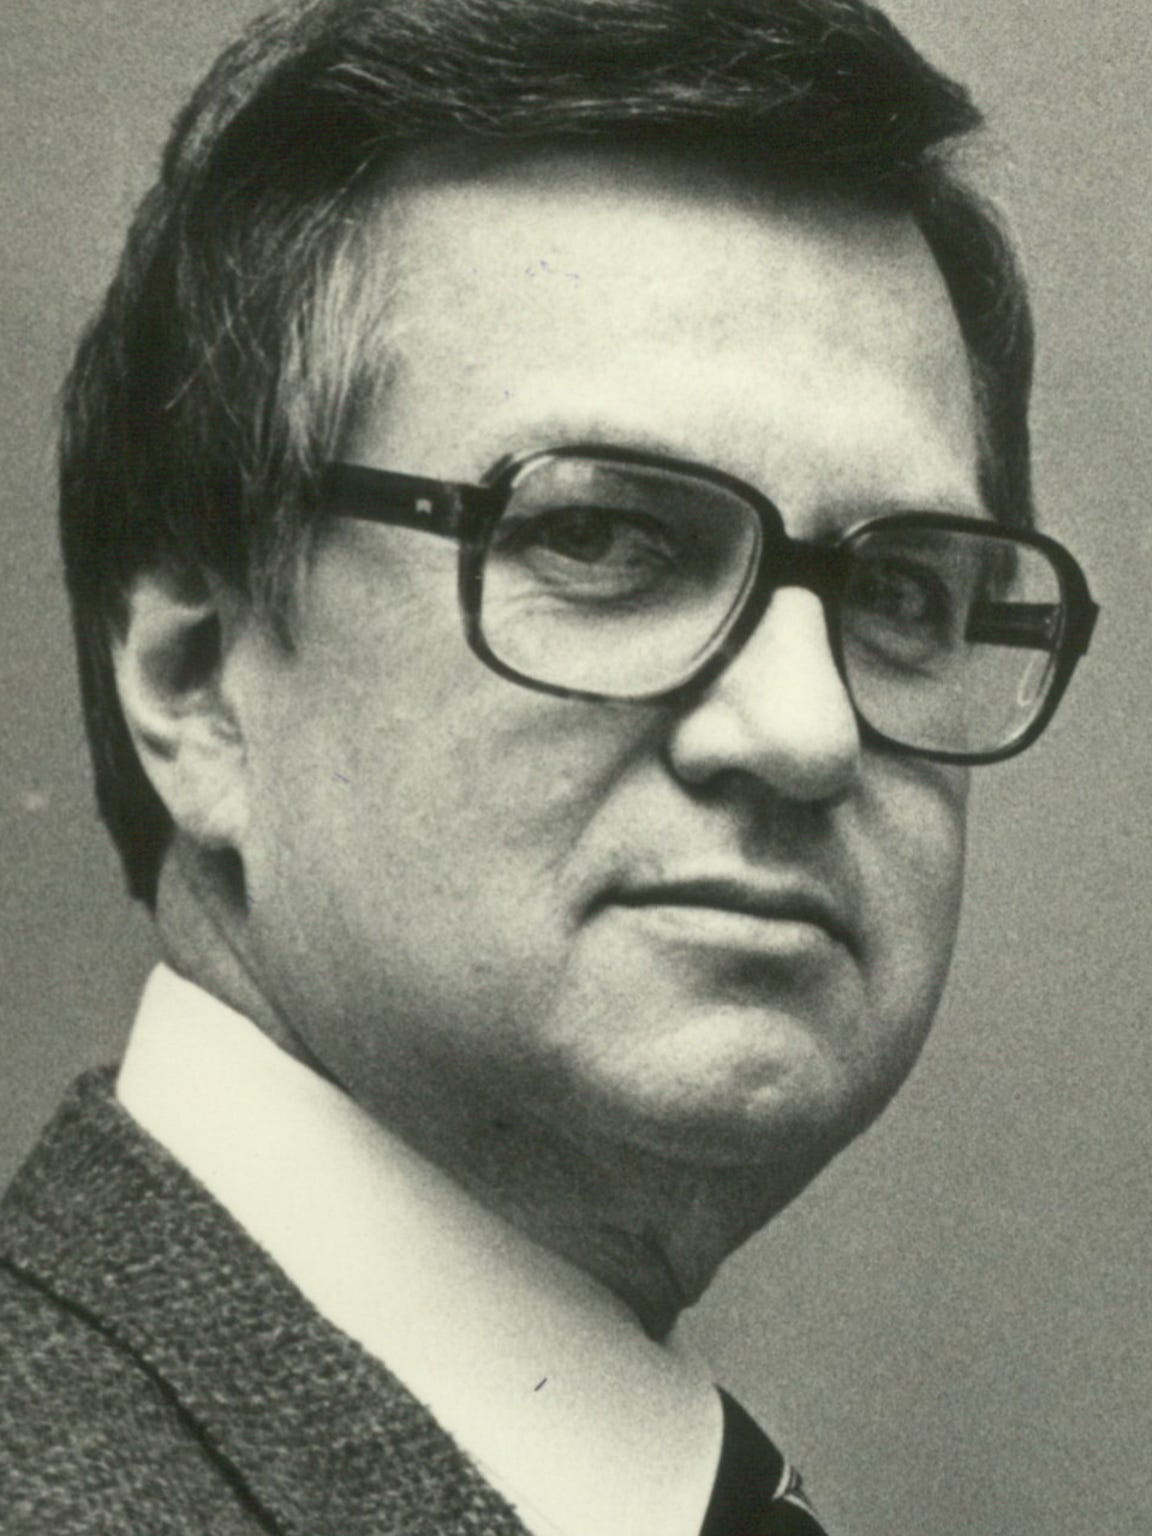 David Johnson is shown when he was chairman of Nicolet High School's mathematics department in 1983.